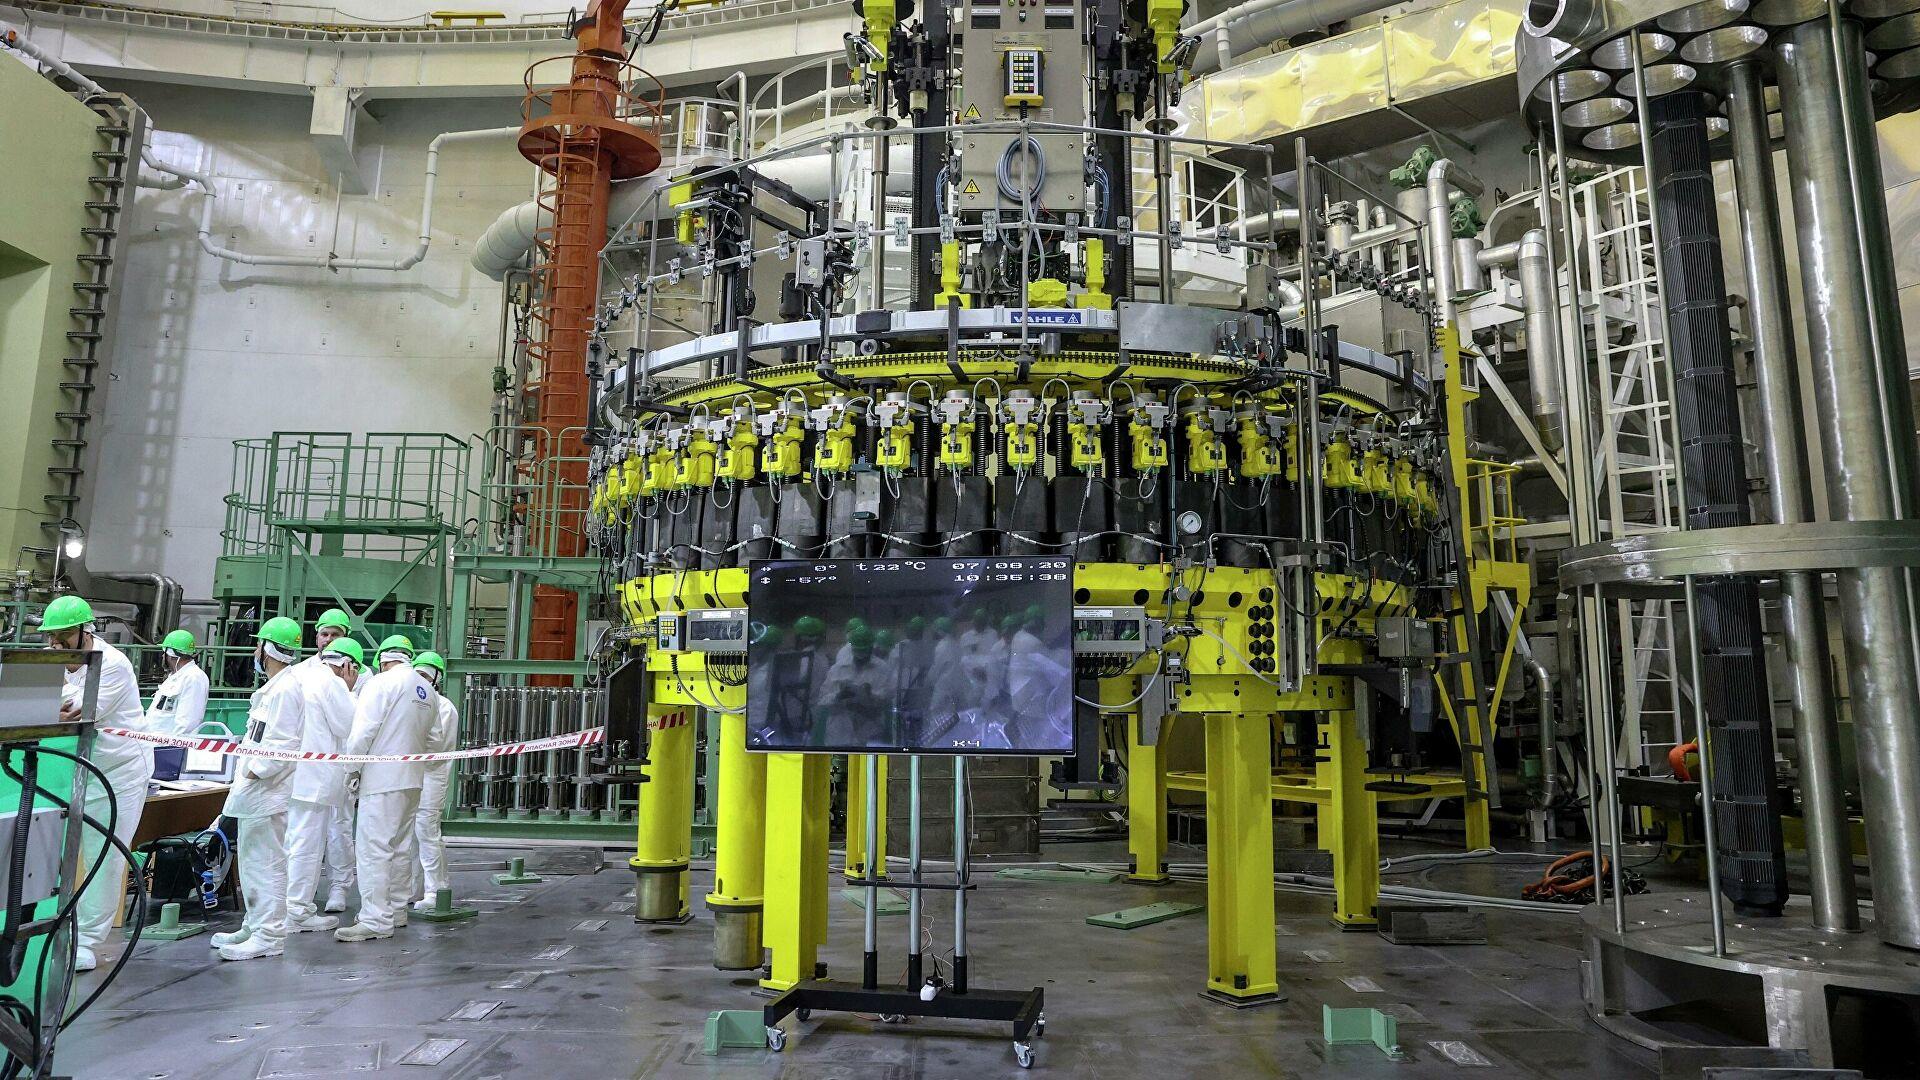 Прибалтика приготовила неприятности для БелАЭС и России БелАЭС,Прибалтика,Россия,Экономика,Мир,Электроэнергия